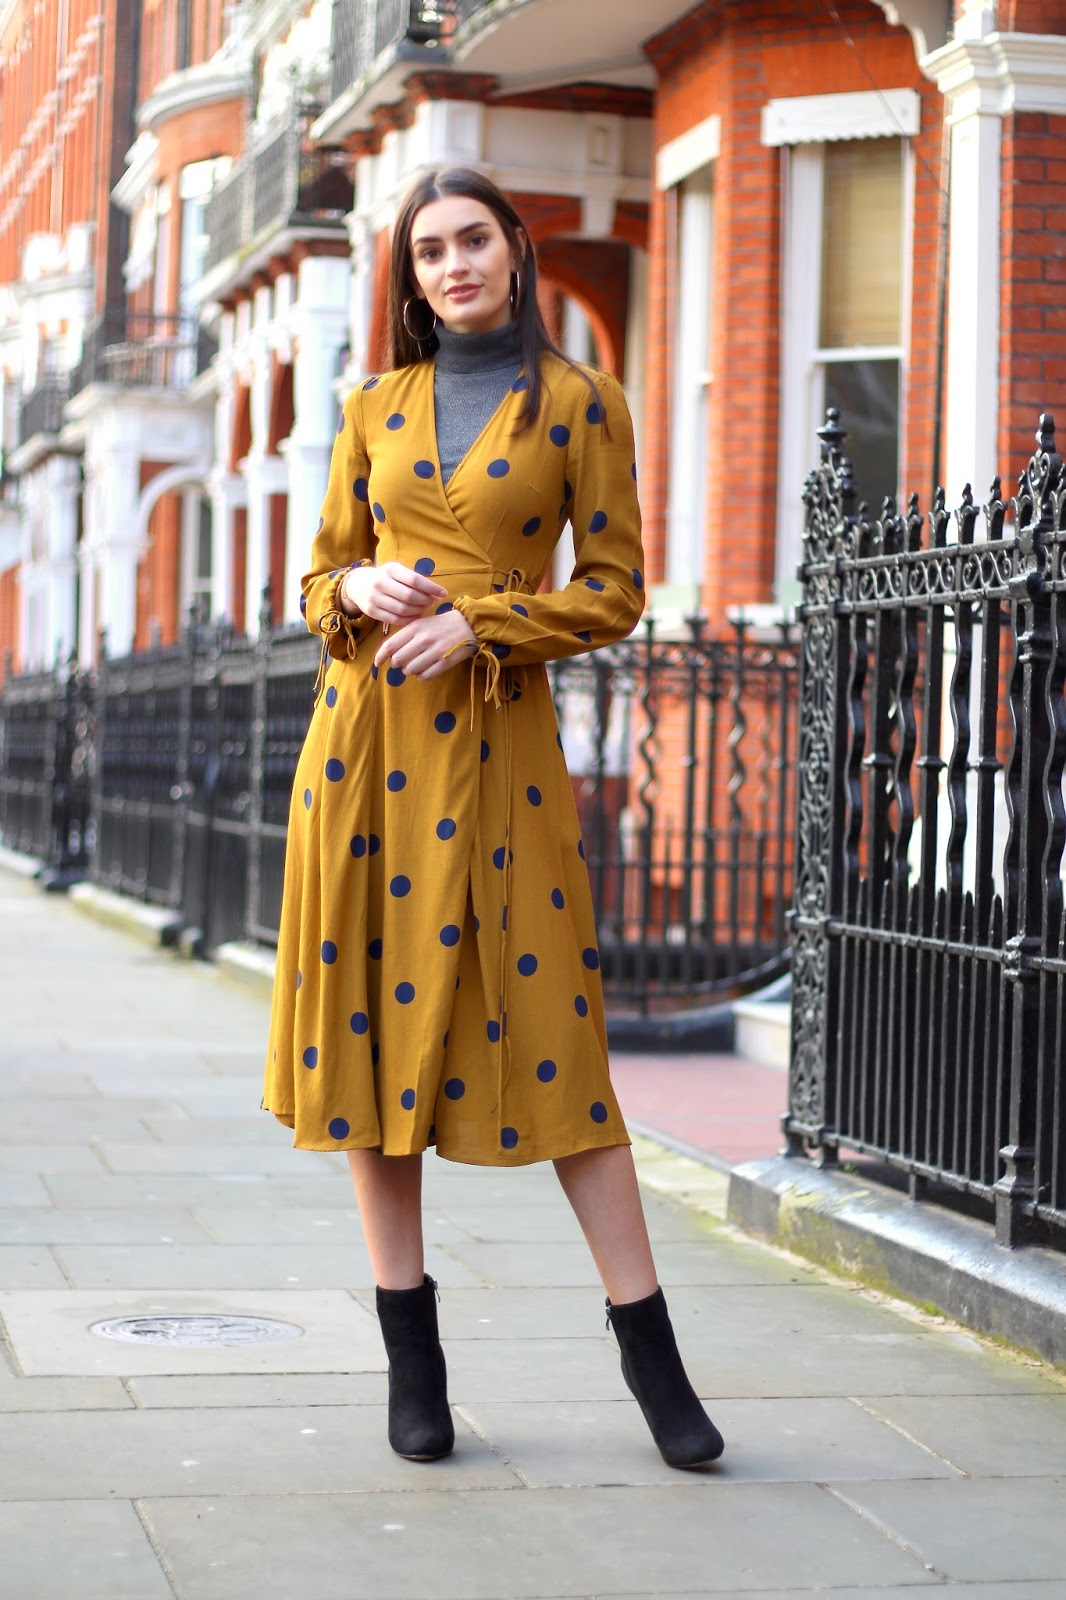 personal style peexo london blog